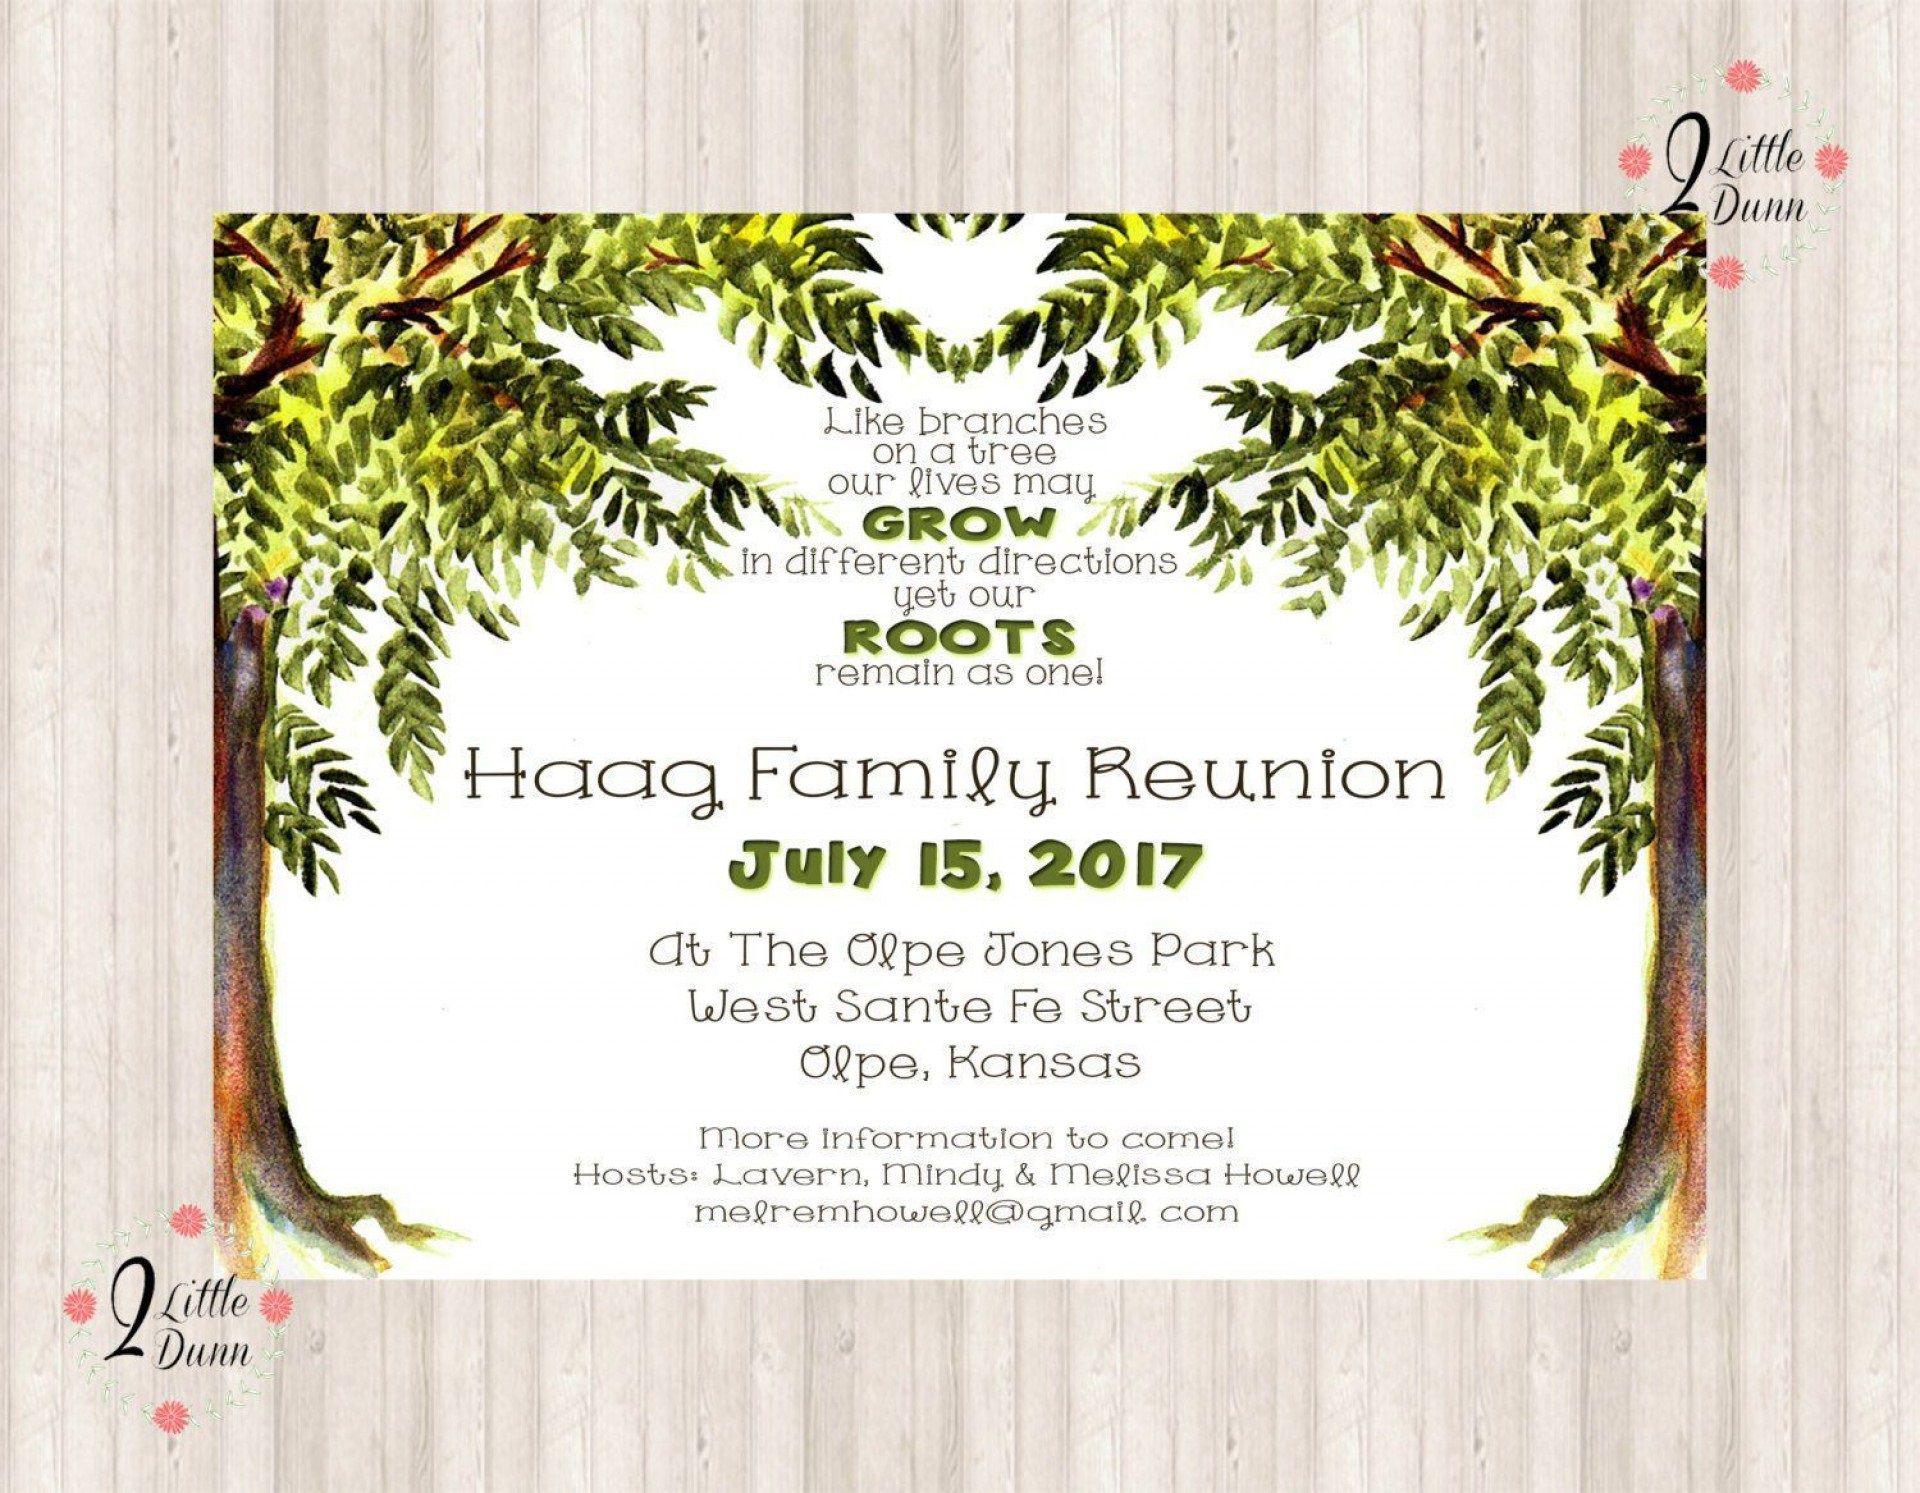 006 Impressive Free Family Reunion Flyer Template Word Idea Full